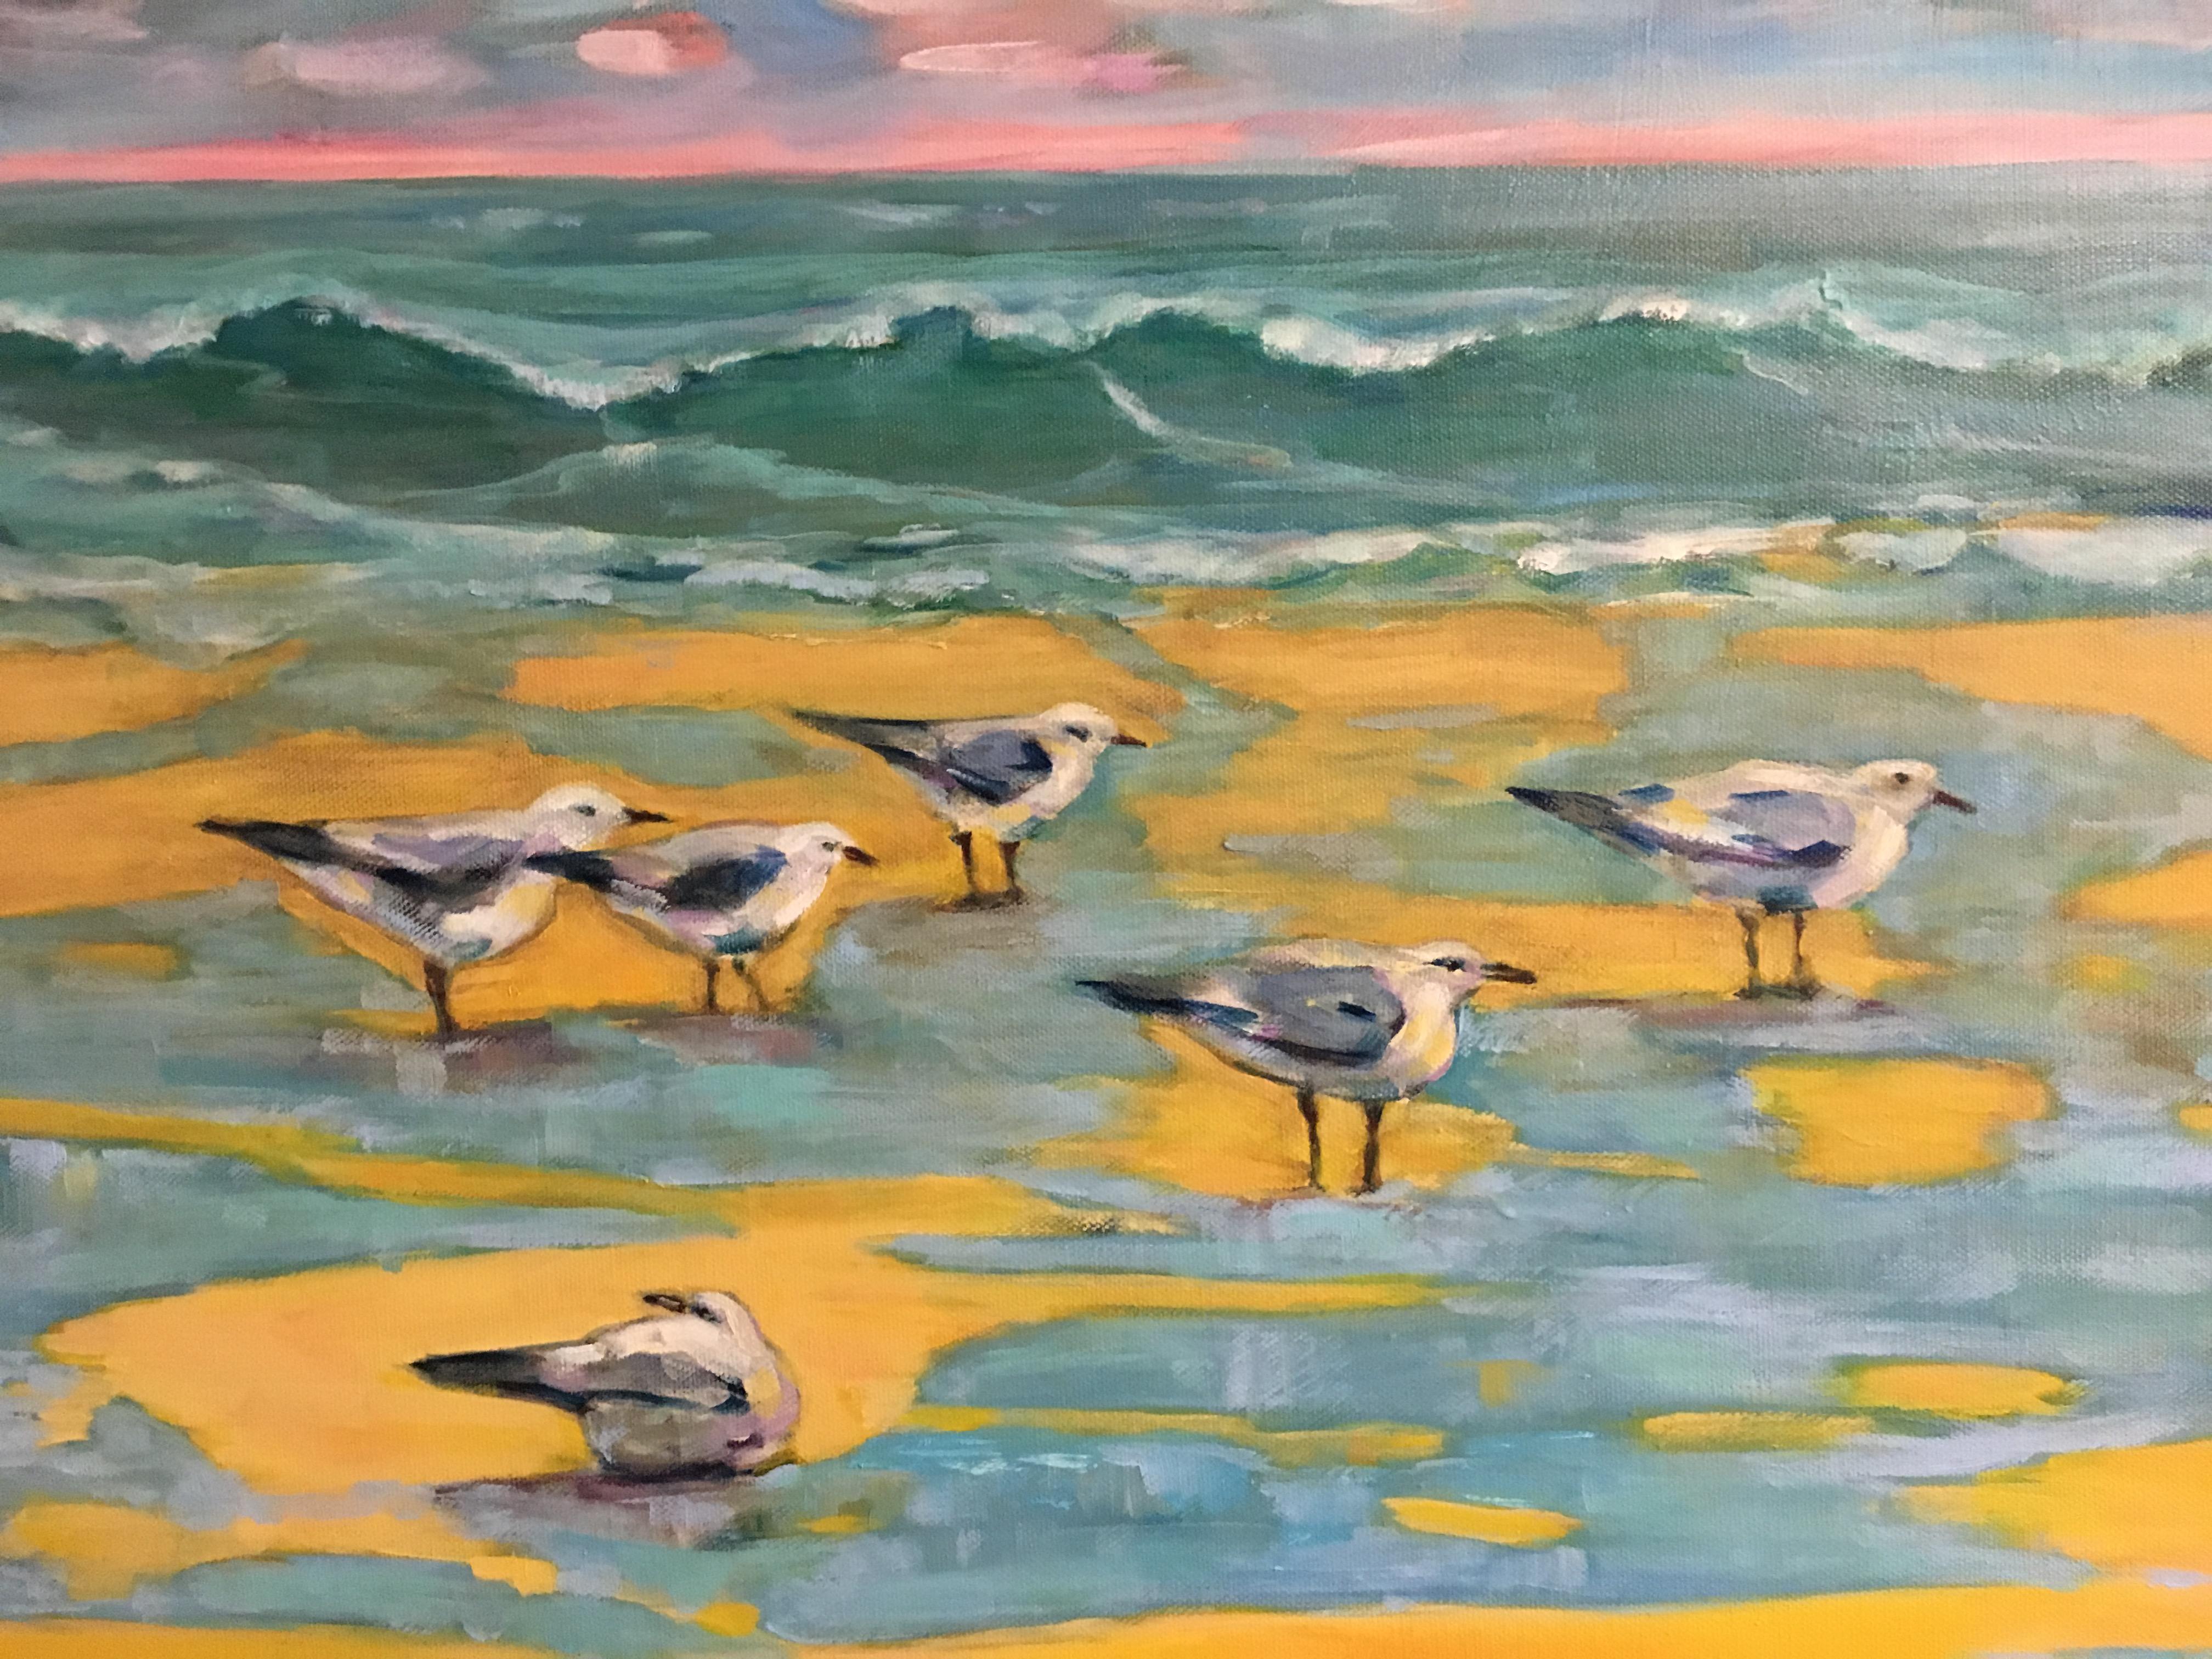 Gulls, herring gulls, water, seascape, lake, storm, oil, painting